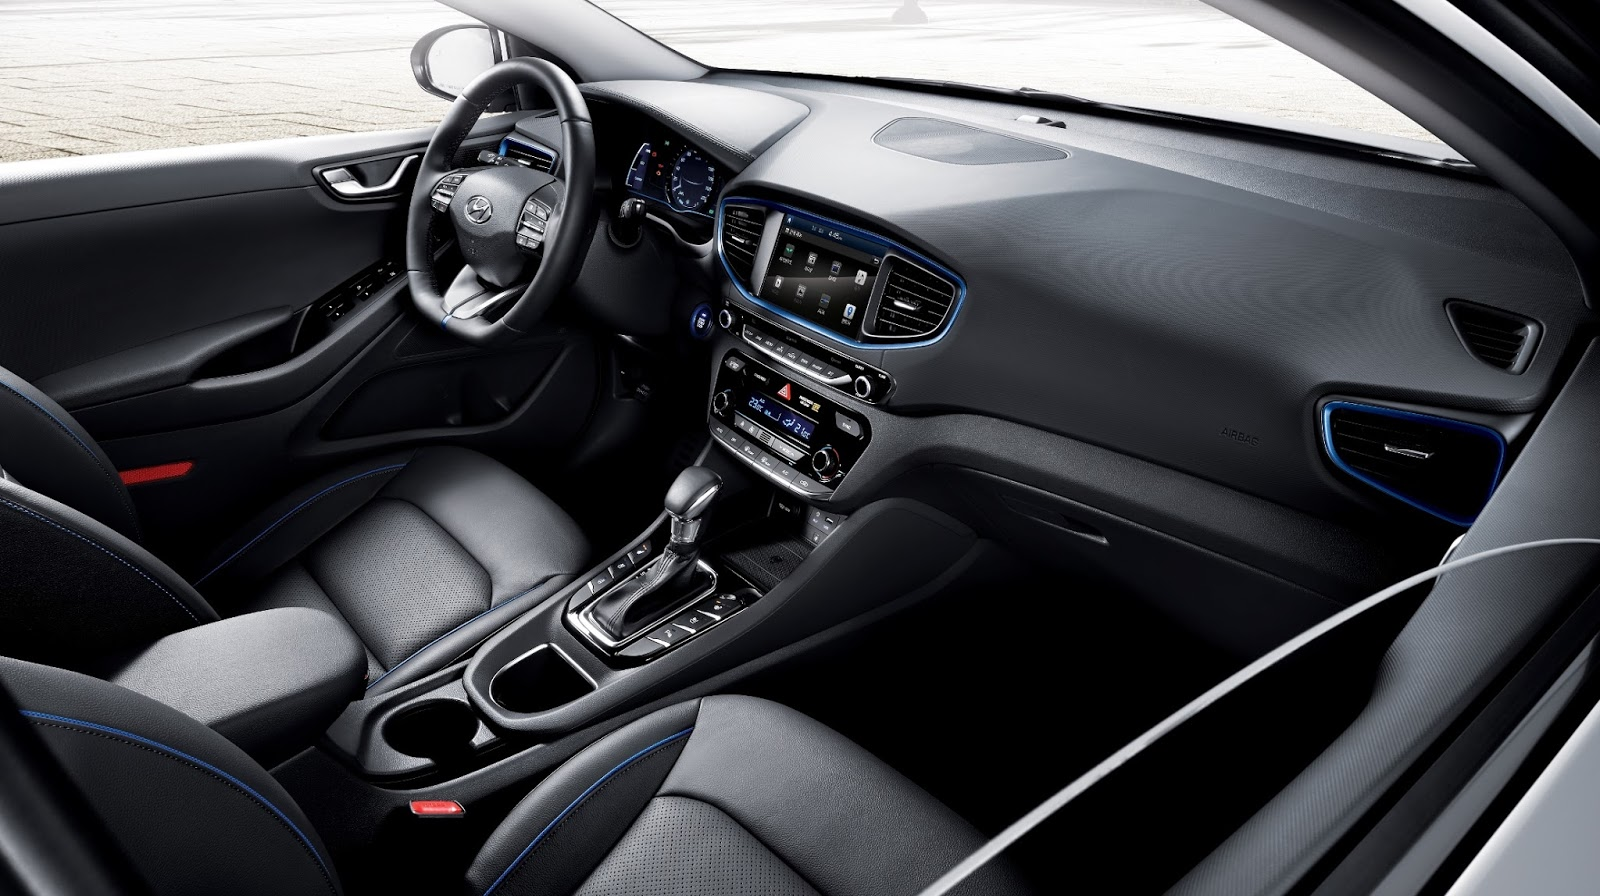 IONIQ%2BA%2BLeap%2BForward%2Bfor%2BHybrid%2BVehicles interior H Hyundai μας παρουσιάζει την προηγμένη υβριδική της τεχνολογία